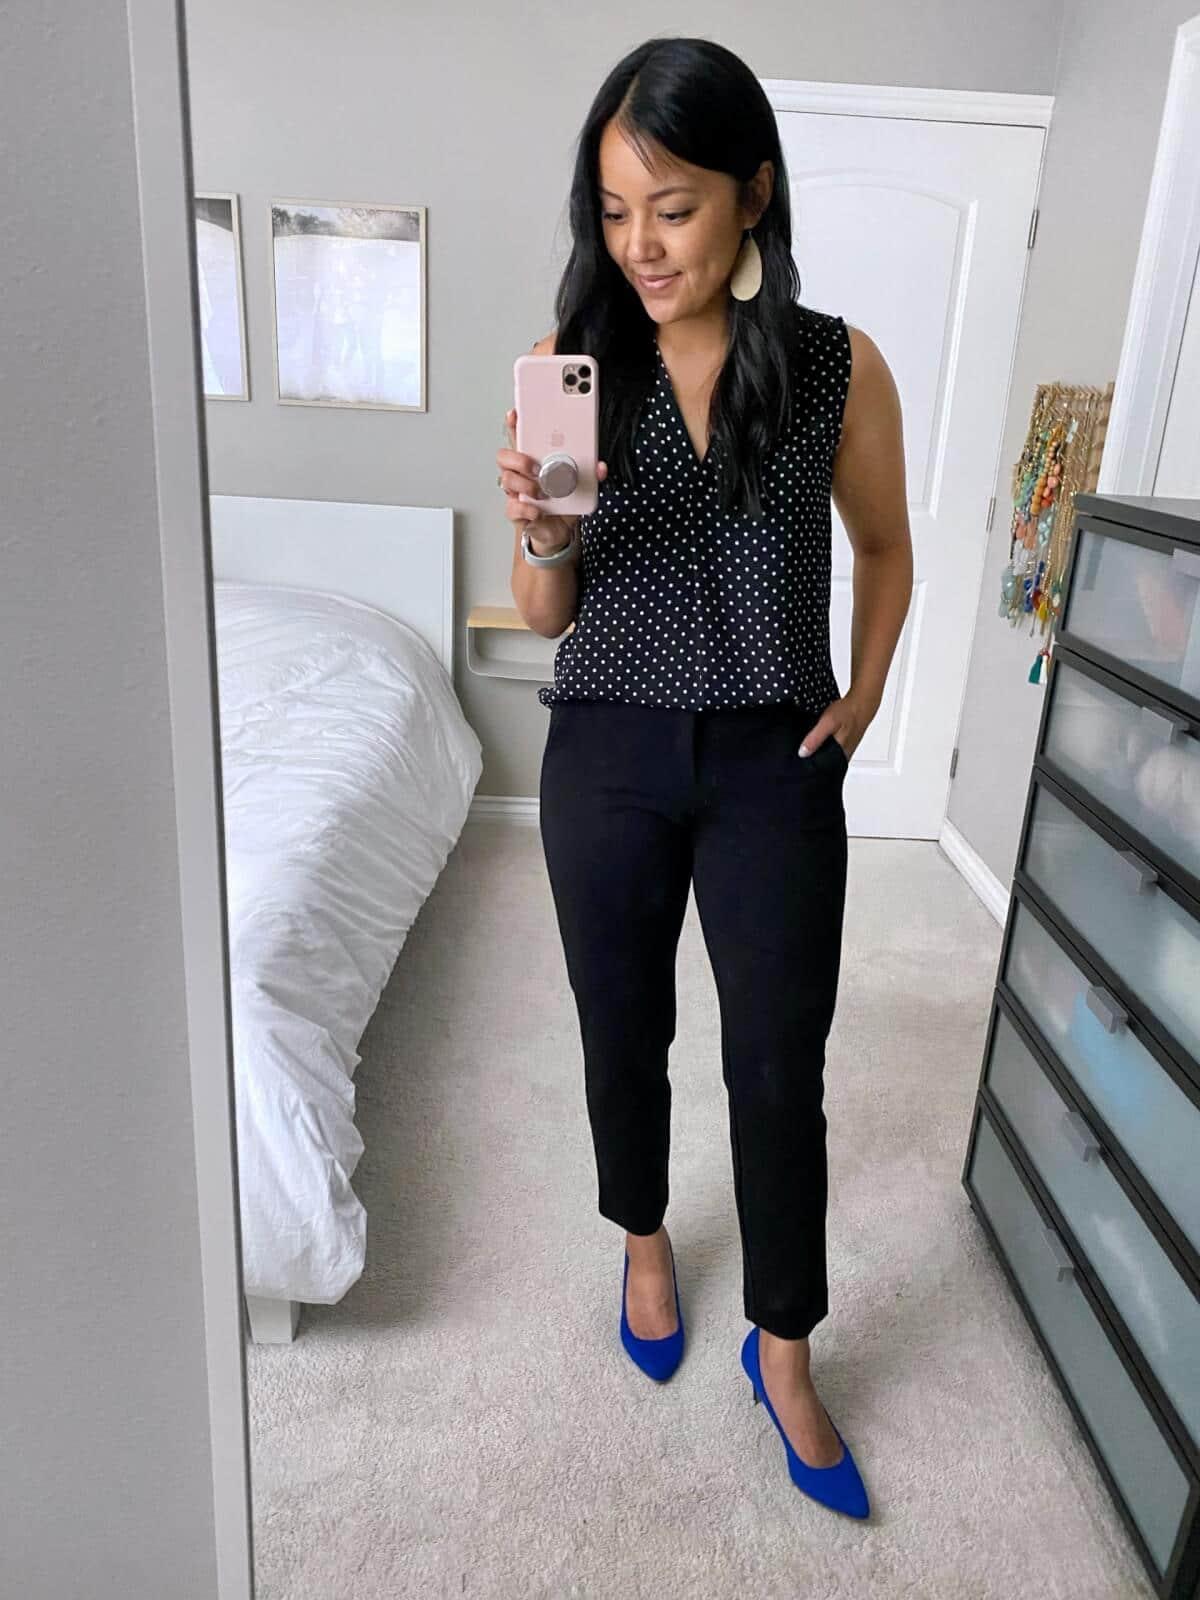 NSale Business Casual Outfit: polka dot tank + black slacks + blue pumps + white earrings